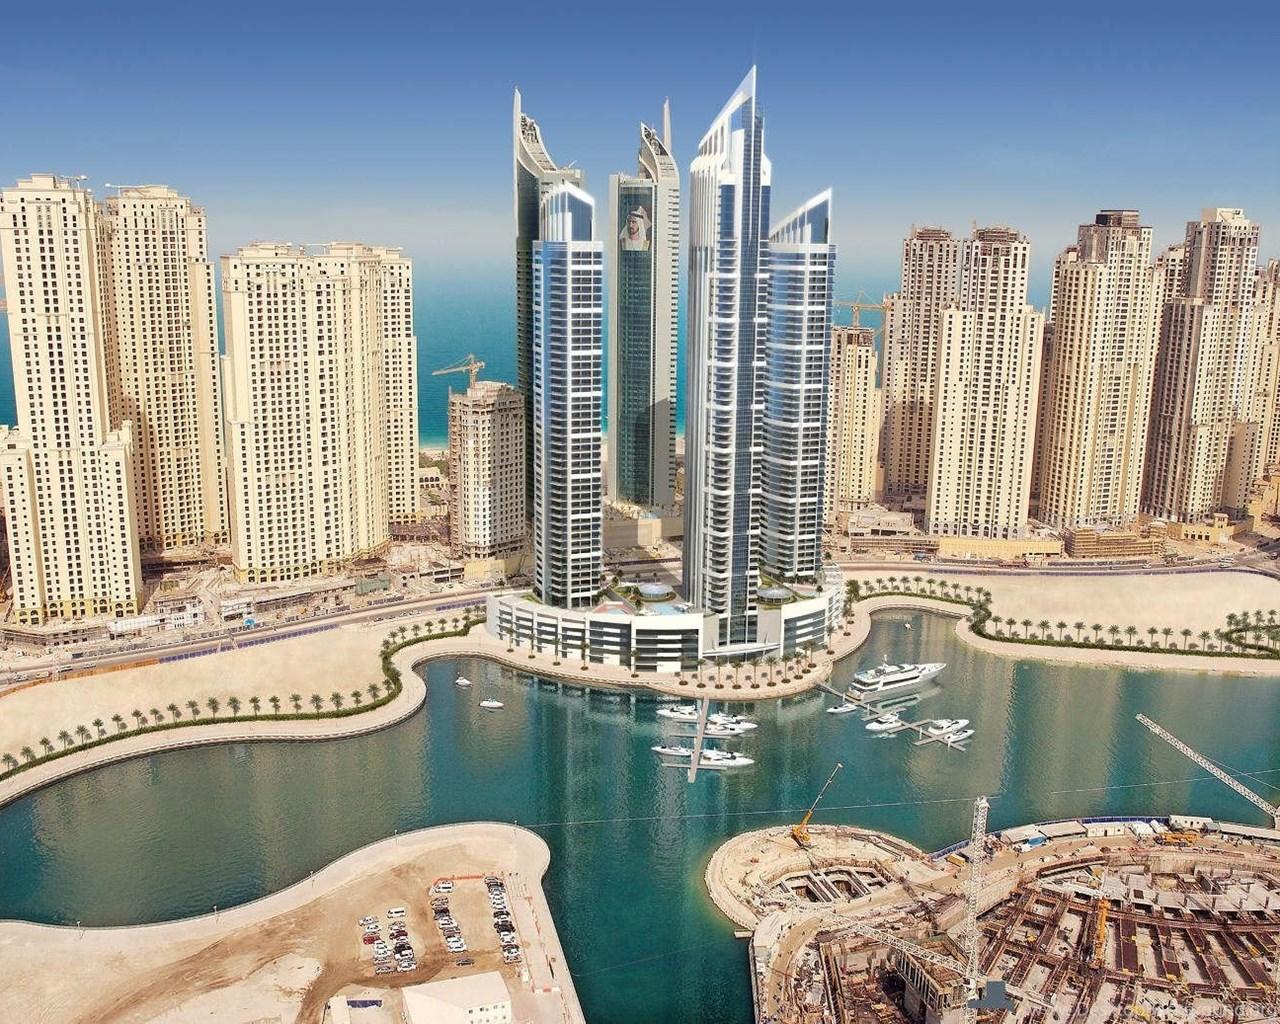 dubai city photos download for desktop wallpapers desktop background